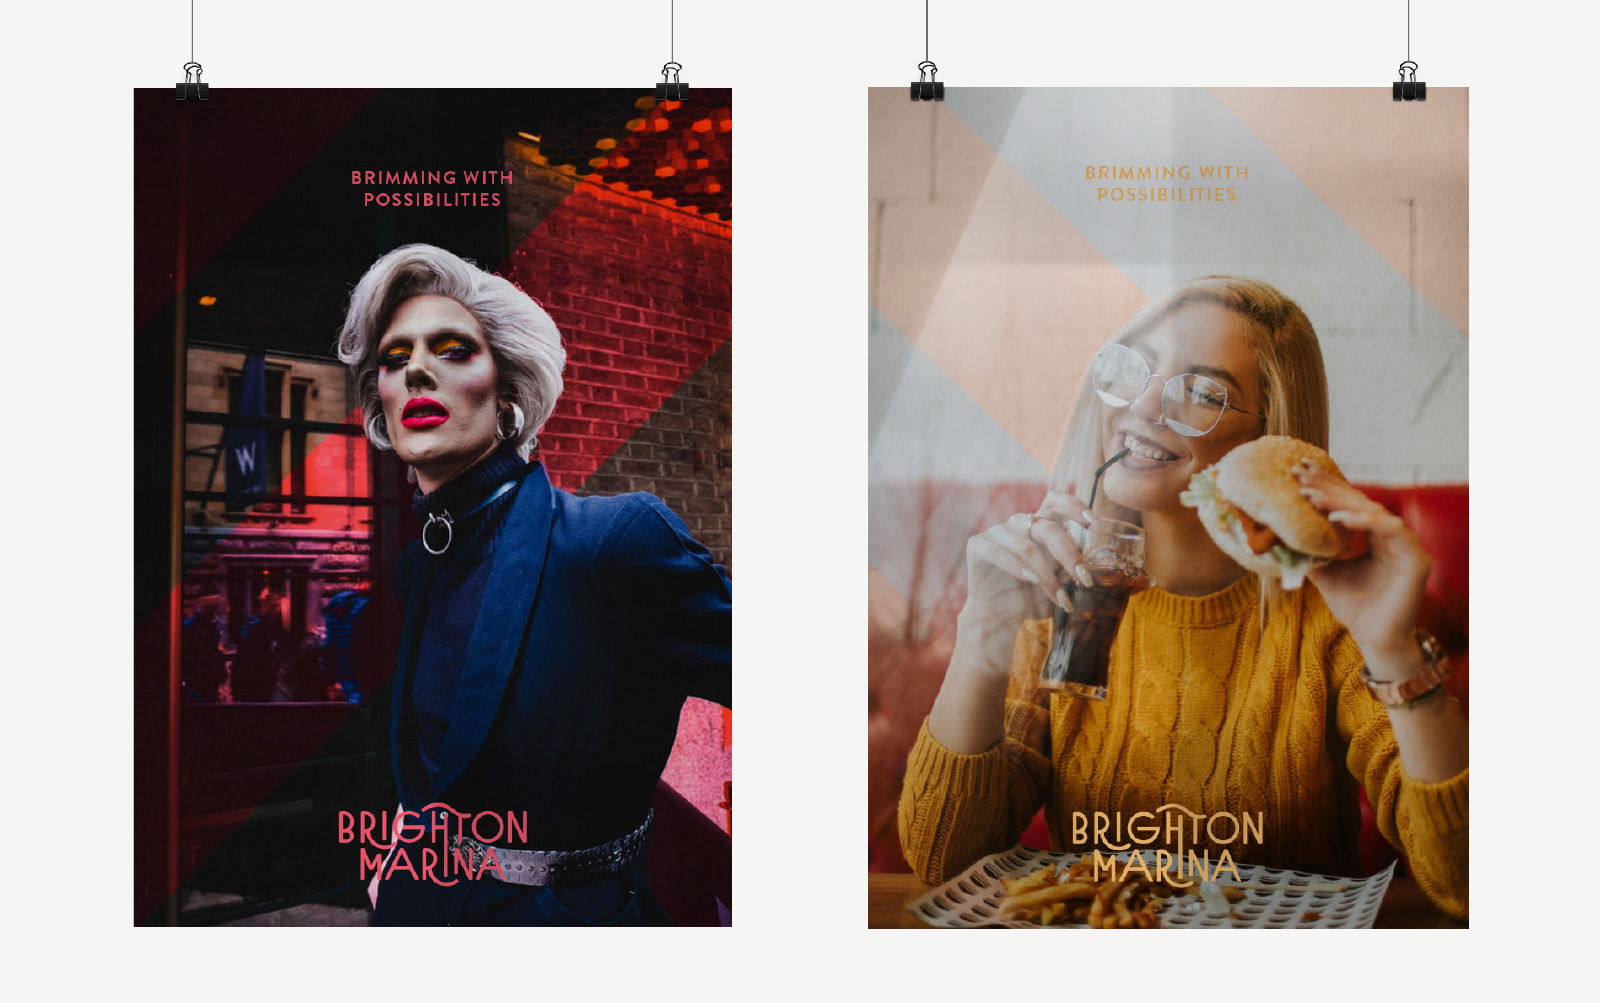 BrightonMarina_Article_Posters2